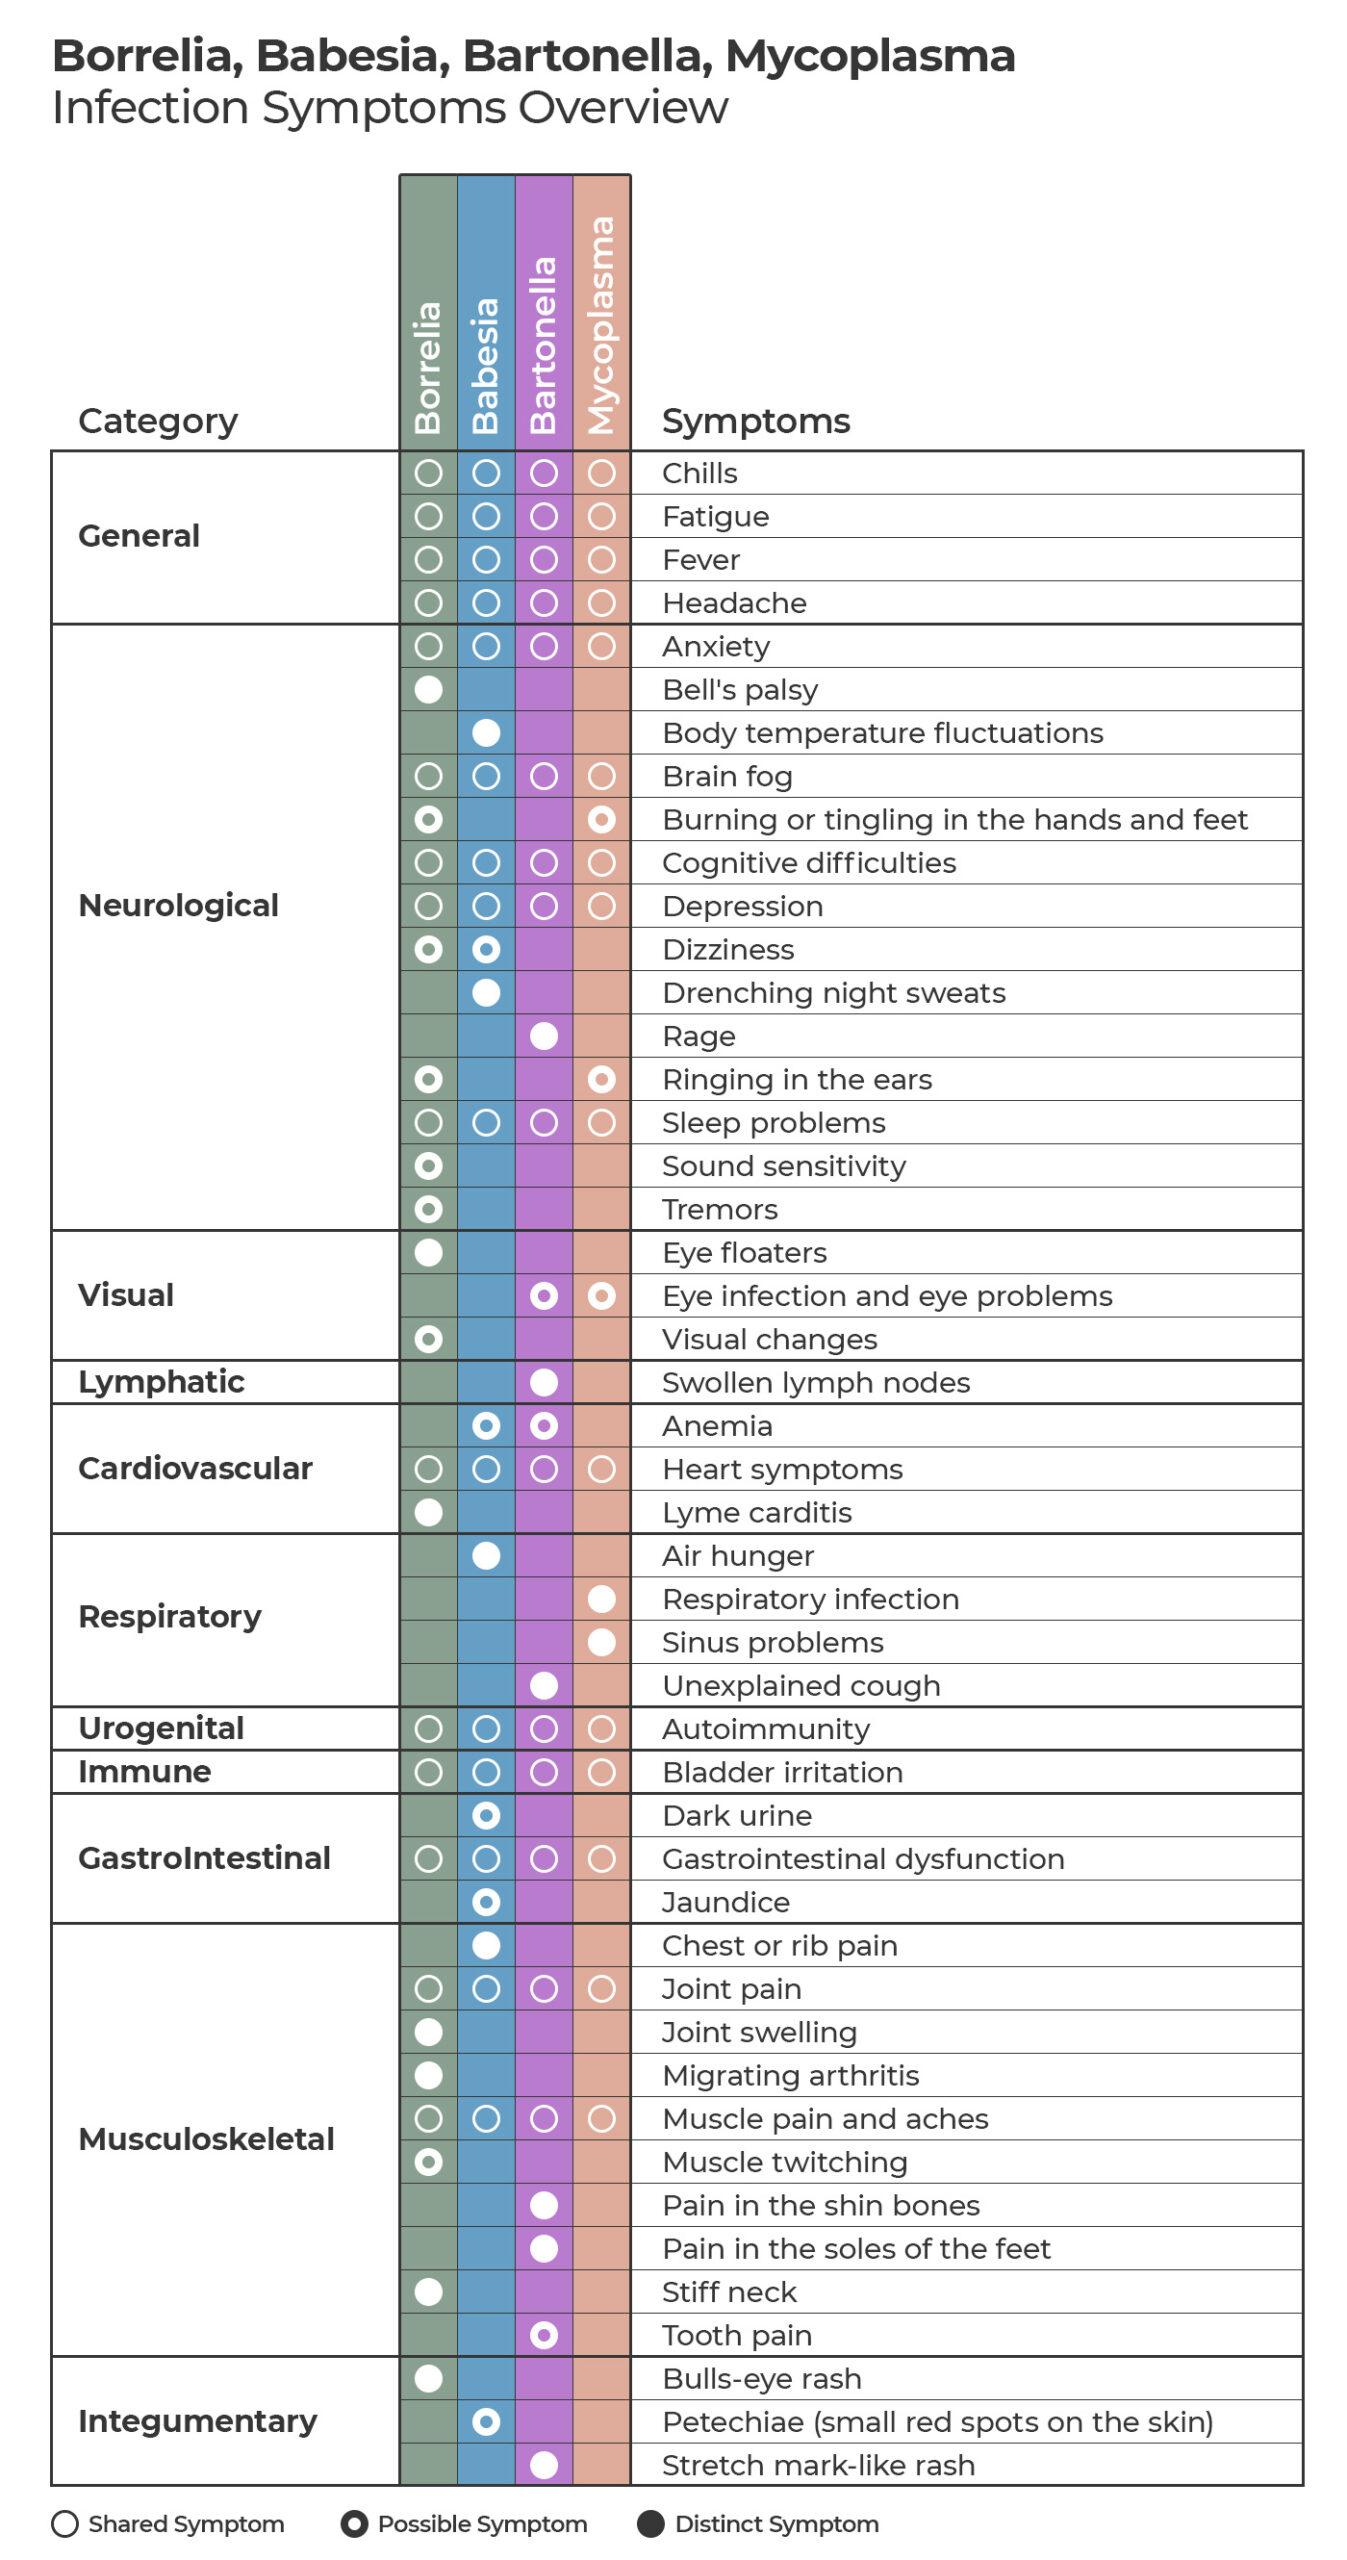 Borrelia, Babesia, Bartonella, and Mycoplasma Symptoms Overview